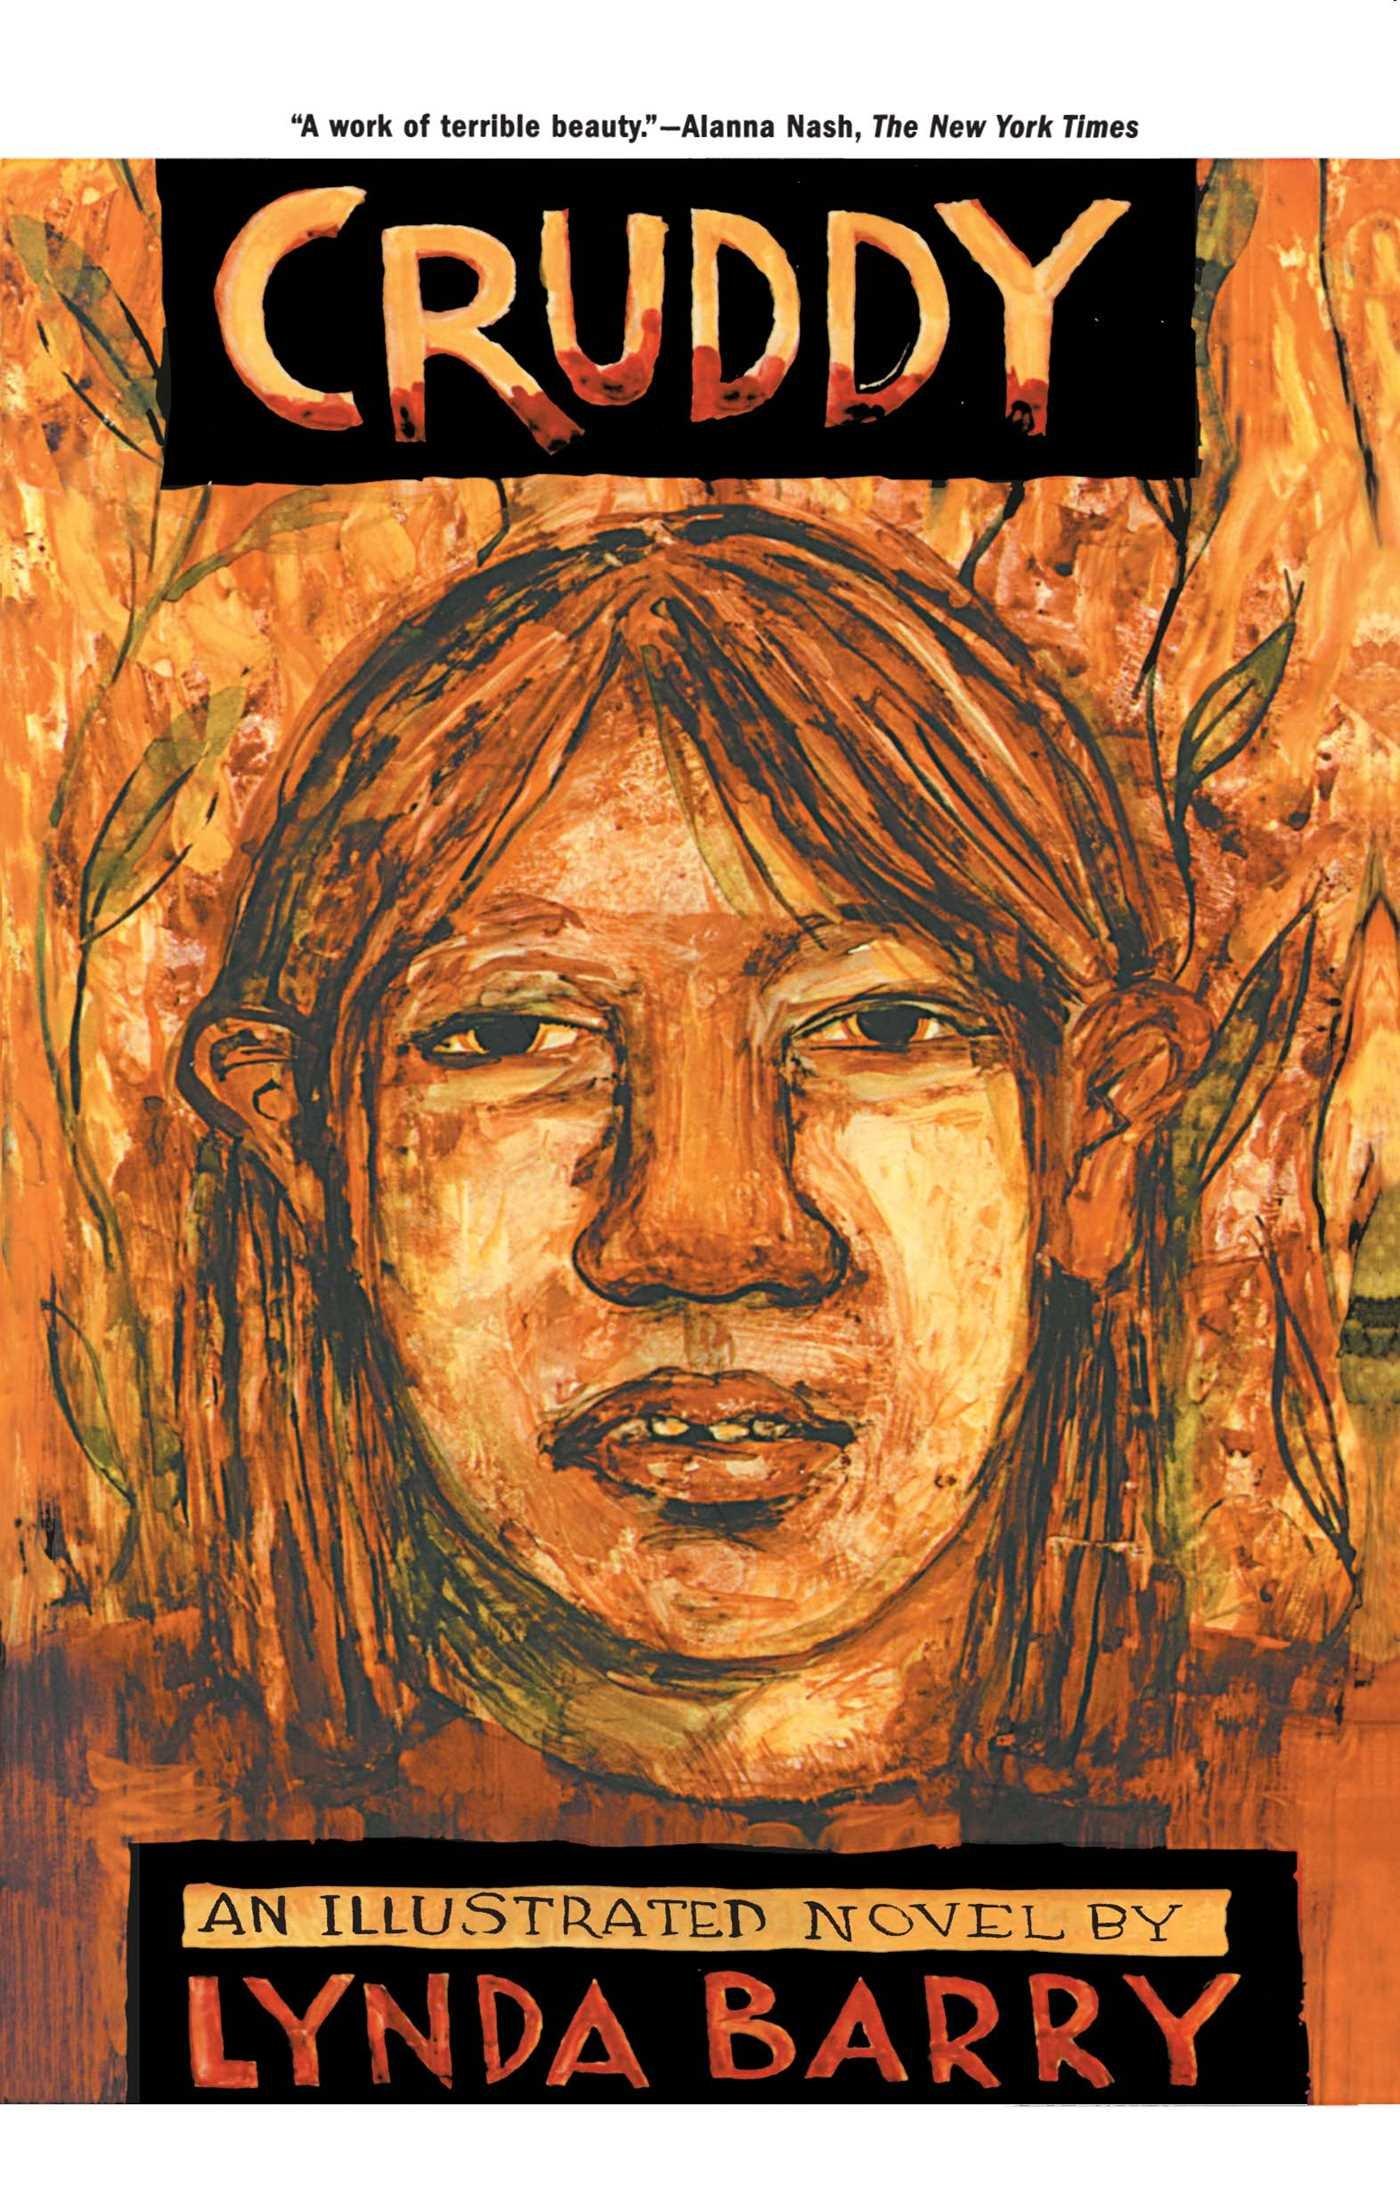 Amazon.com: Cruddy: An Illustrated Novel (9780684838465): Barry ...